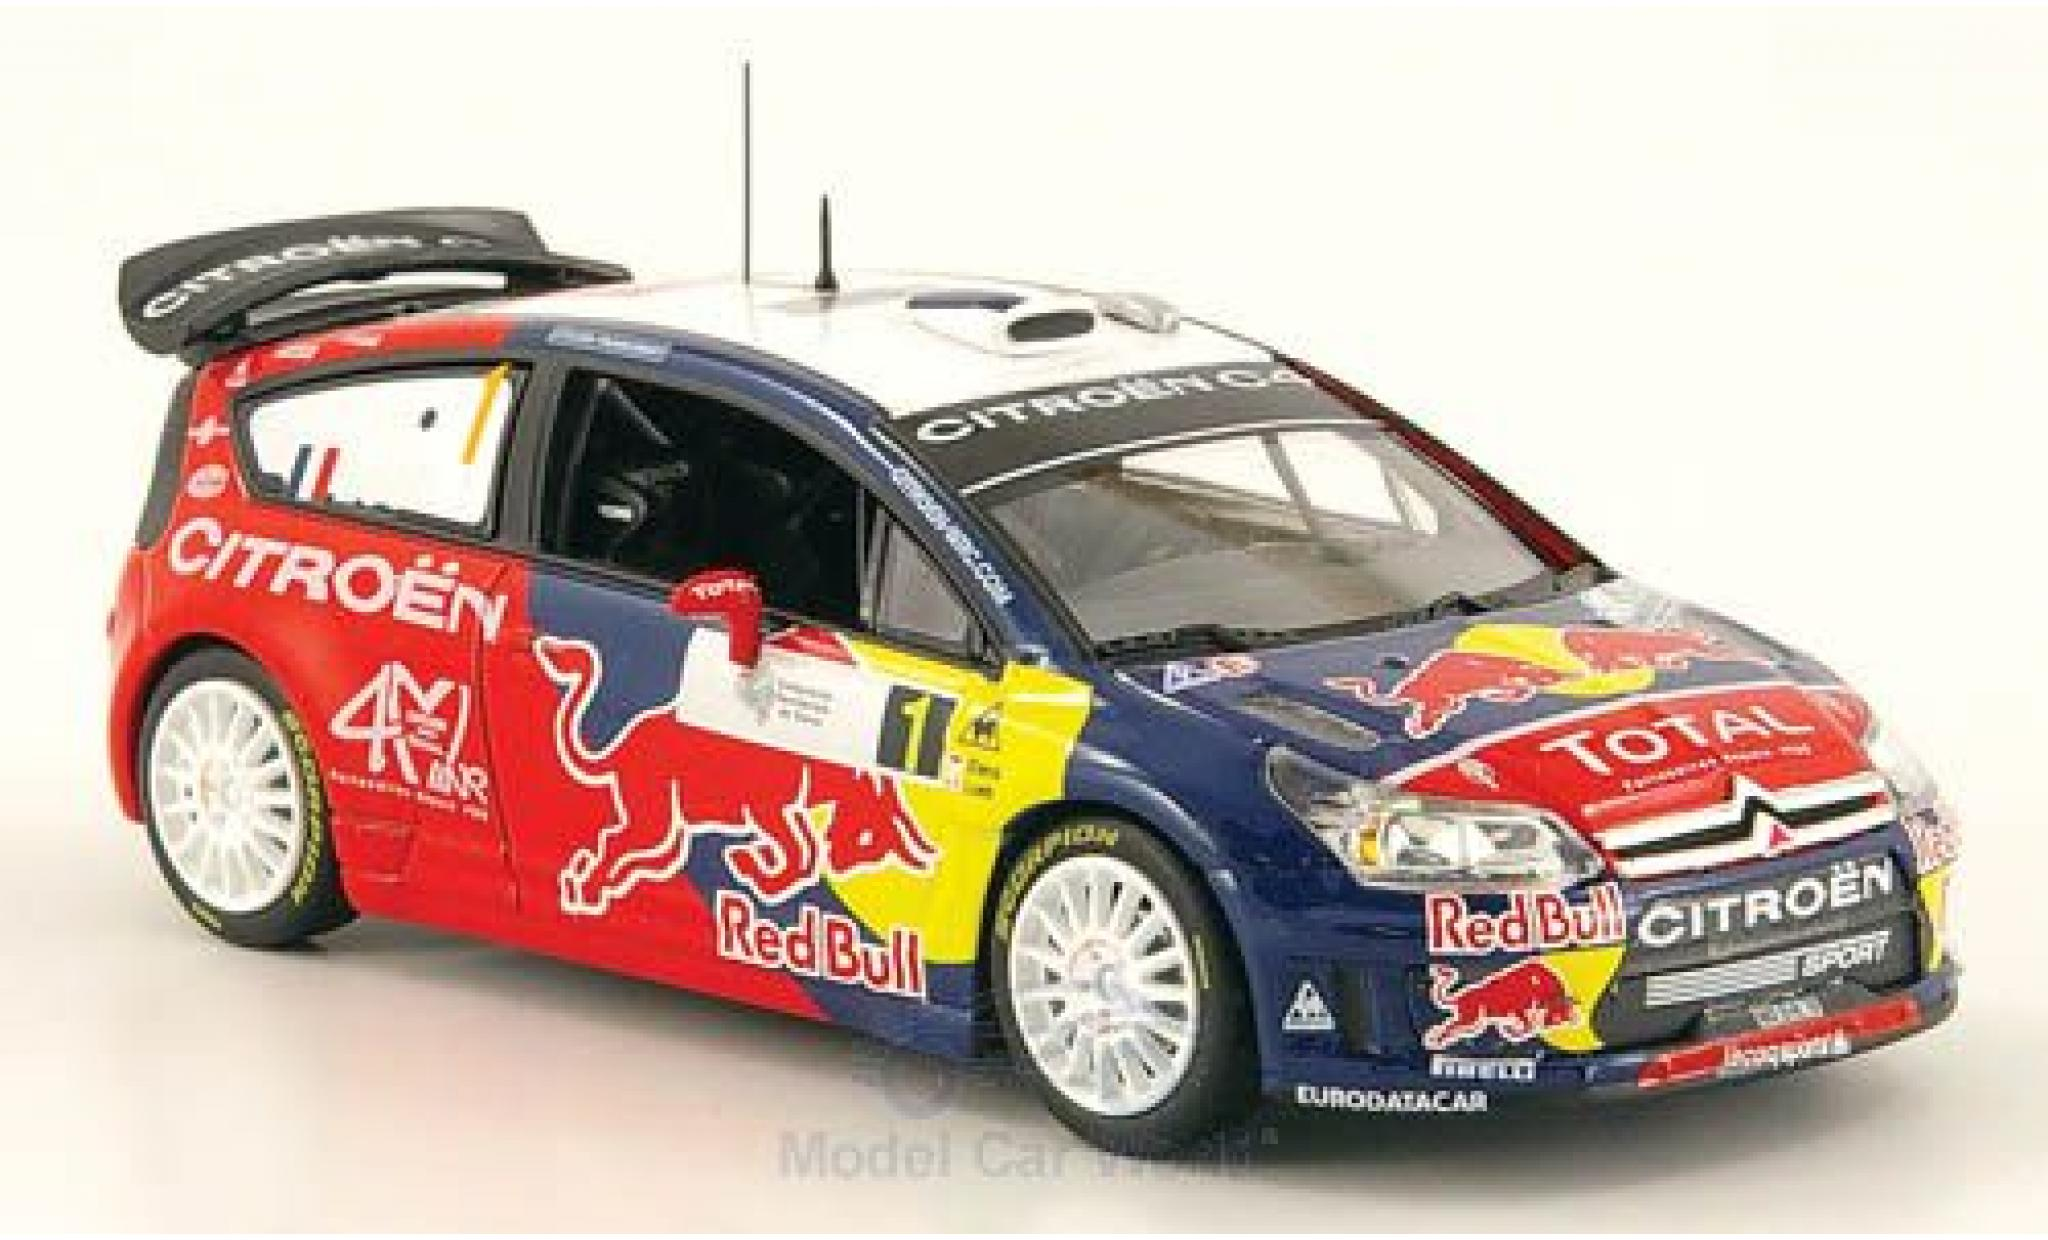 Citroen C4 WRC 1/43 Norev WRC No.1 Red Bull Tour de Corse 2008